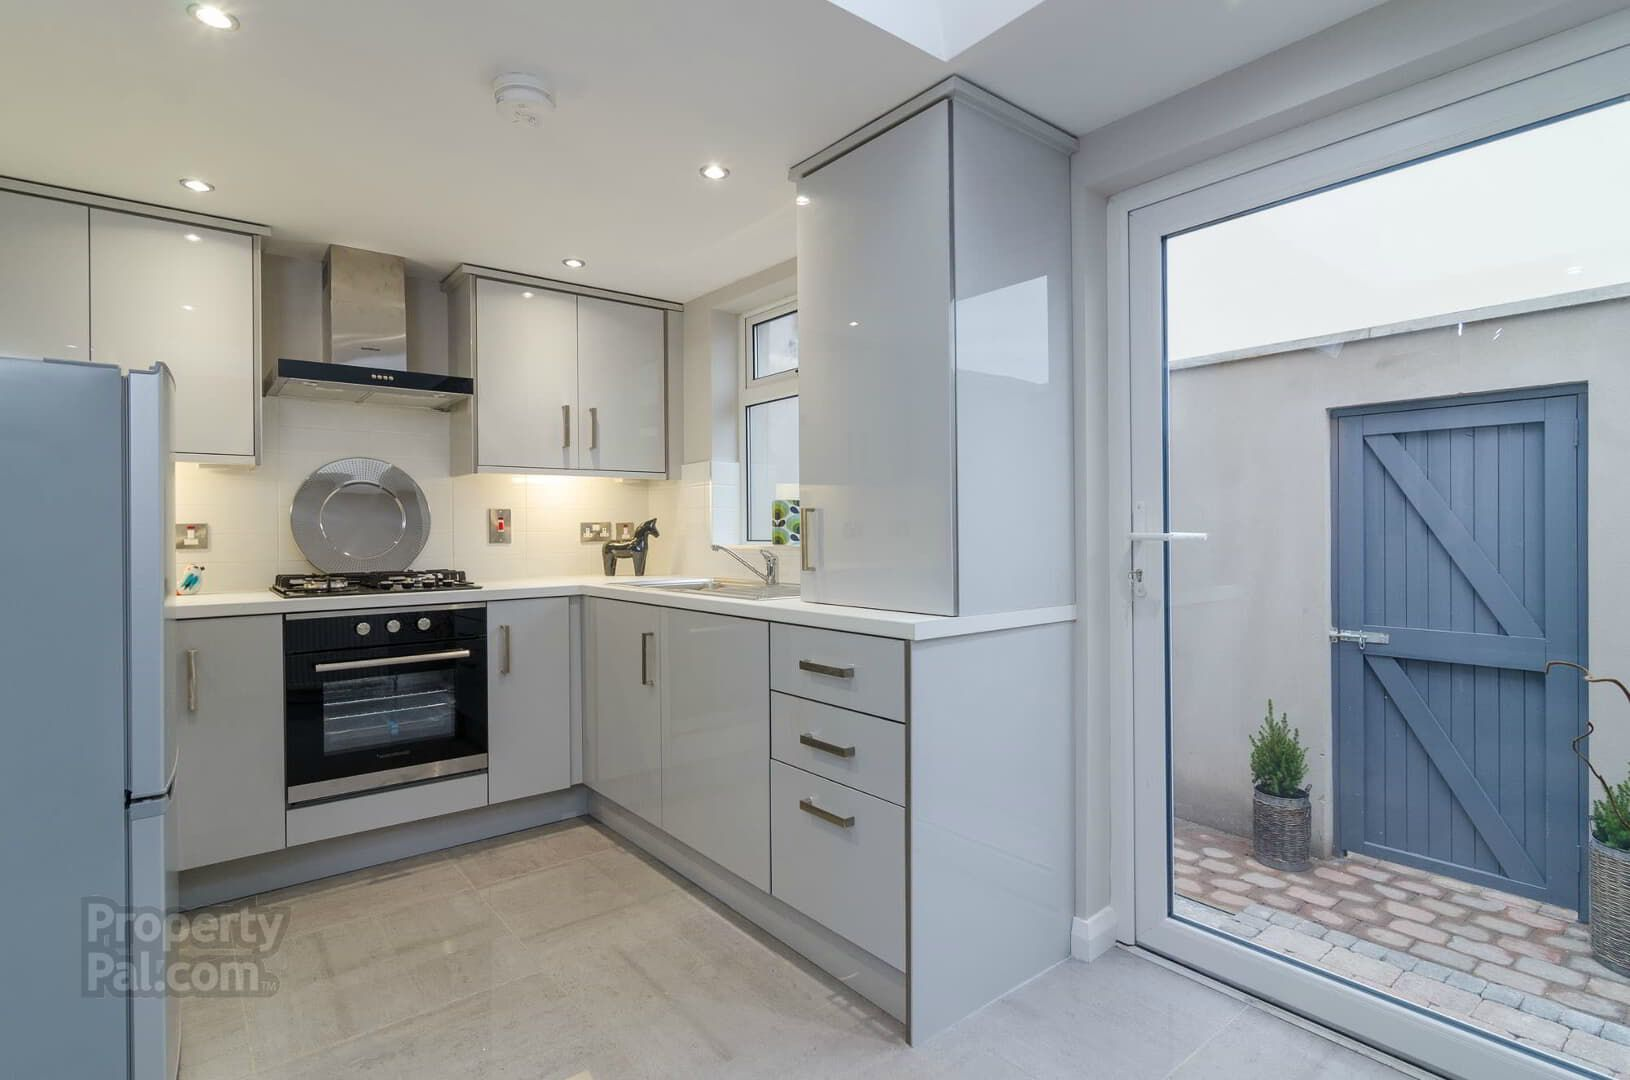 19 Elgin Street, Ormeau Road, Belfast #kitchen   Kitchens ...